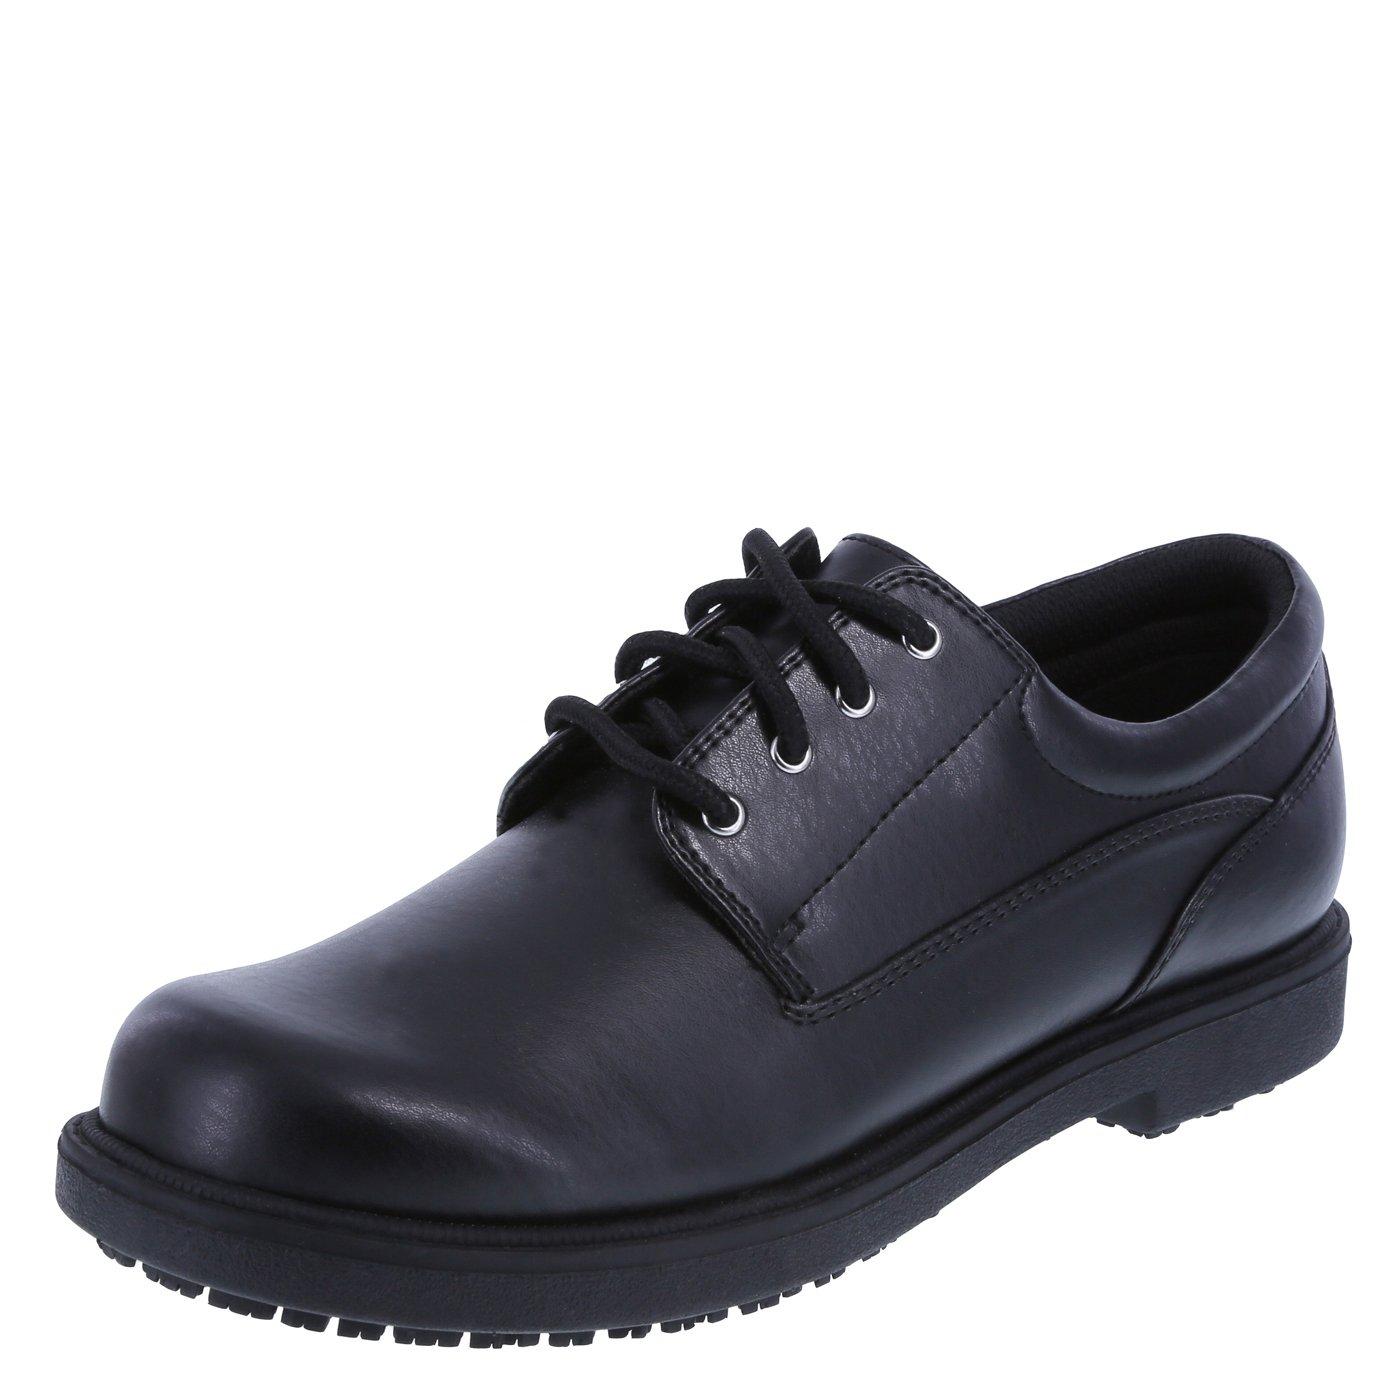 safeTstep Slip Resistant Women's Black Women's Deidre Oxford 5 Wide